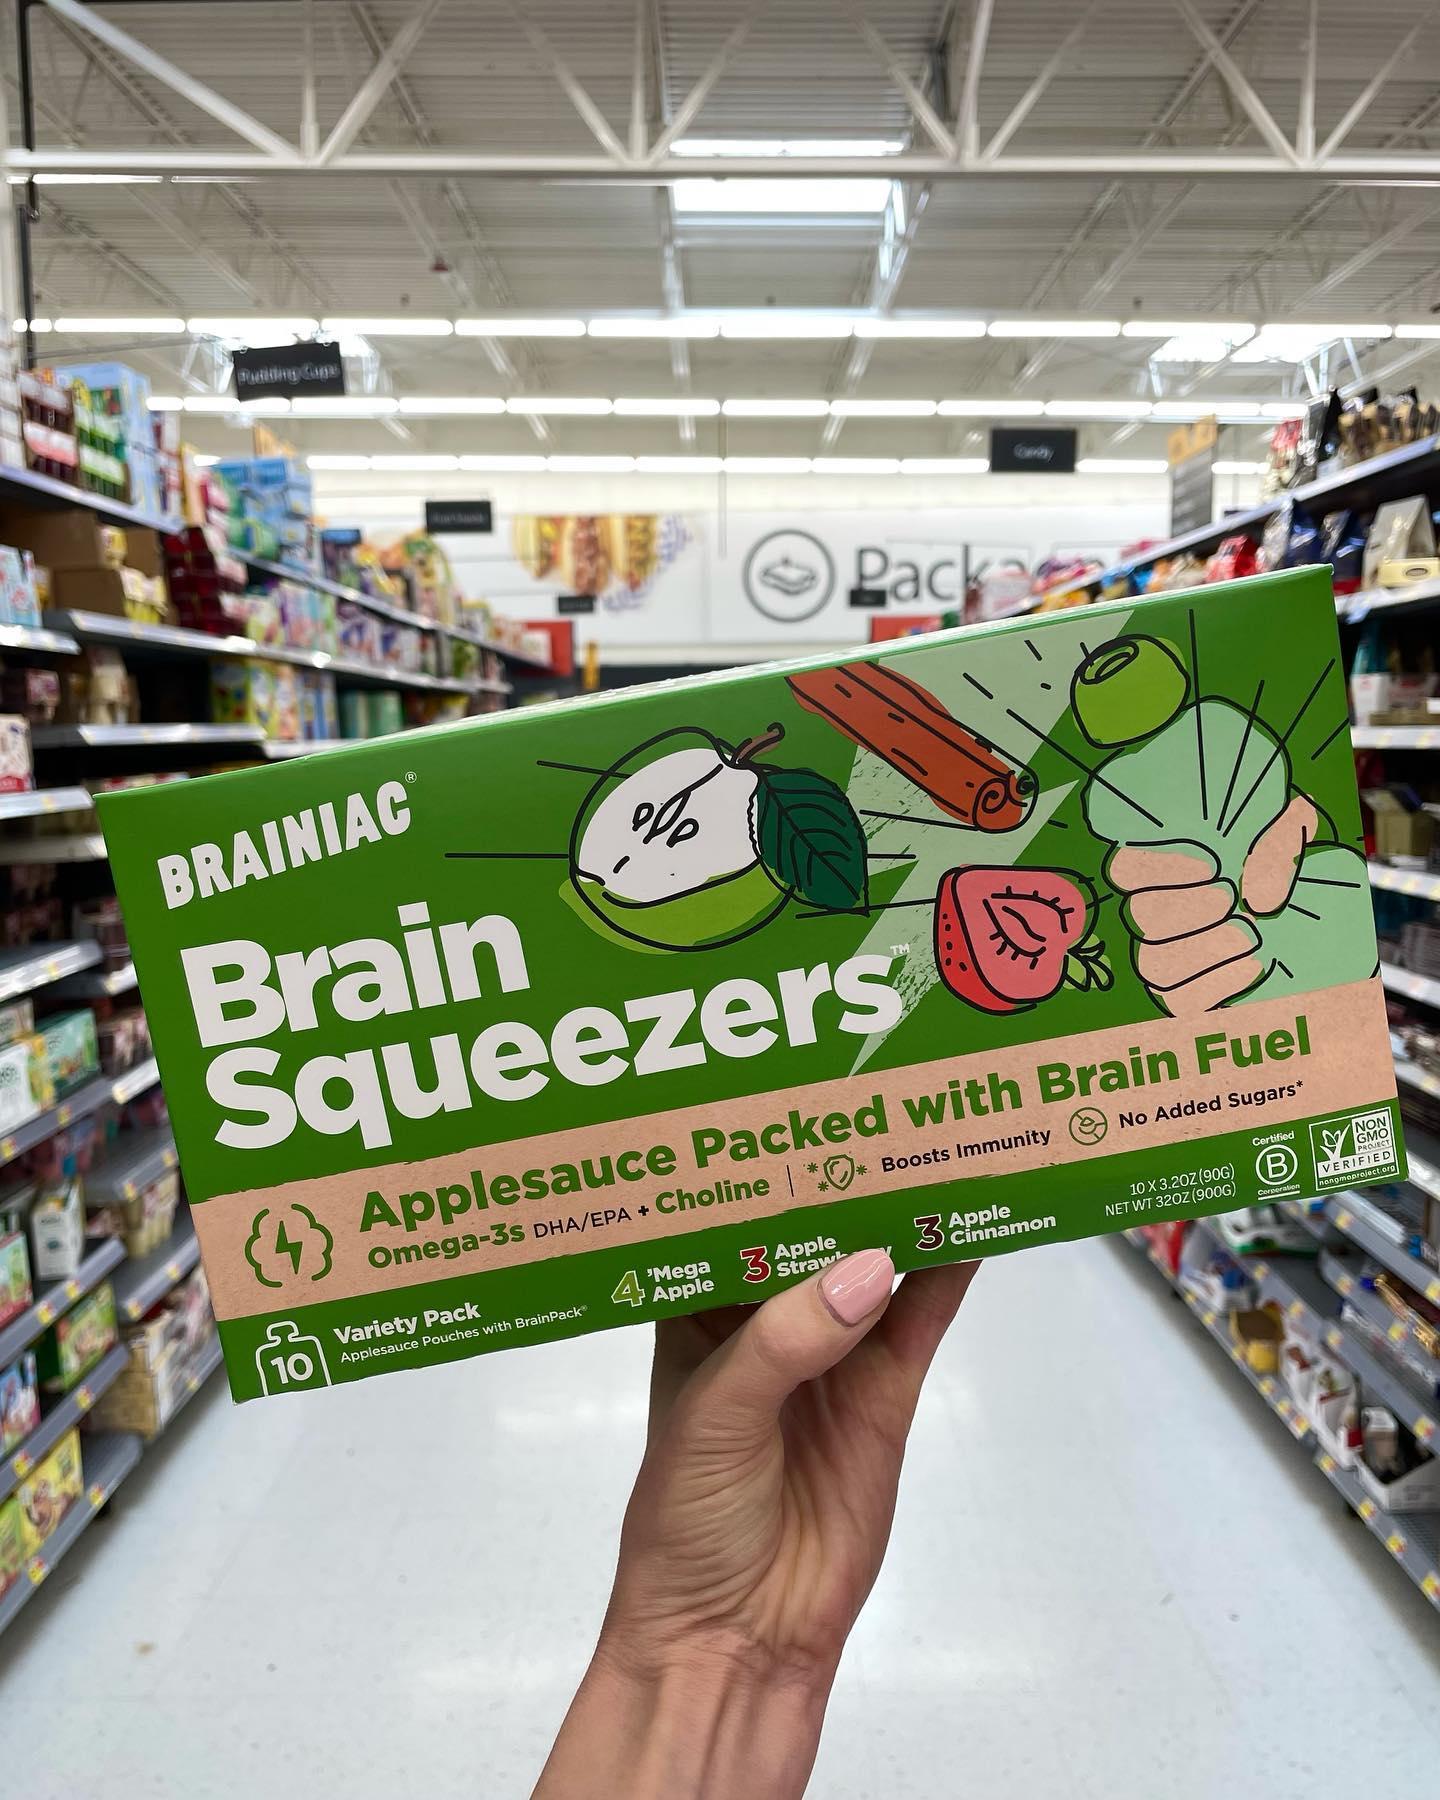 Brainiac Applesauce Back to School Giveaway